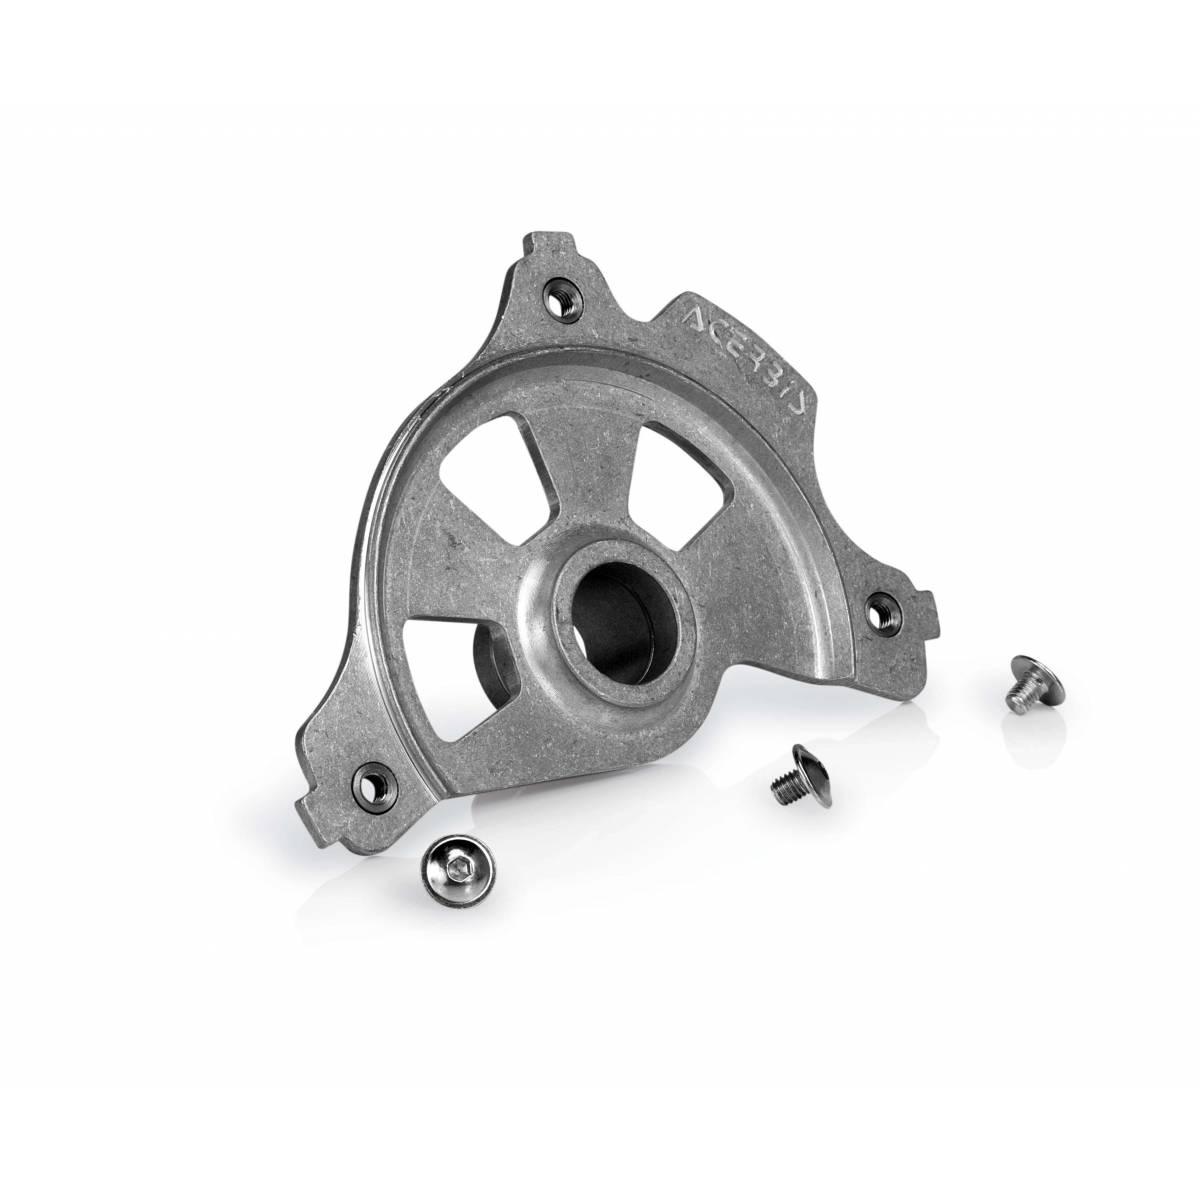 0020077 - Kit Acople Cubredisco Acerbis Rm 125 250 04 13